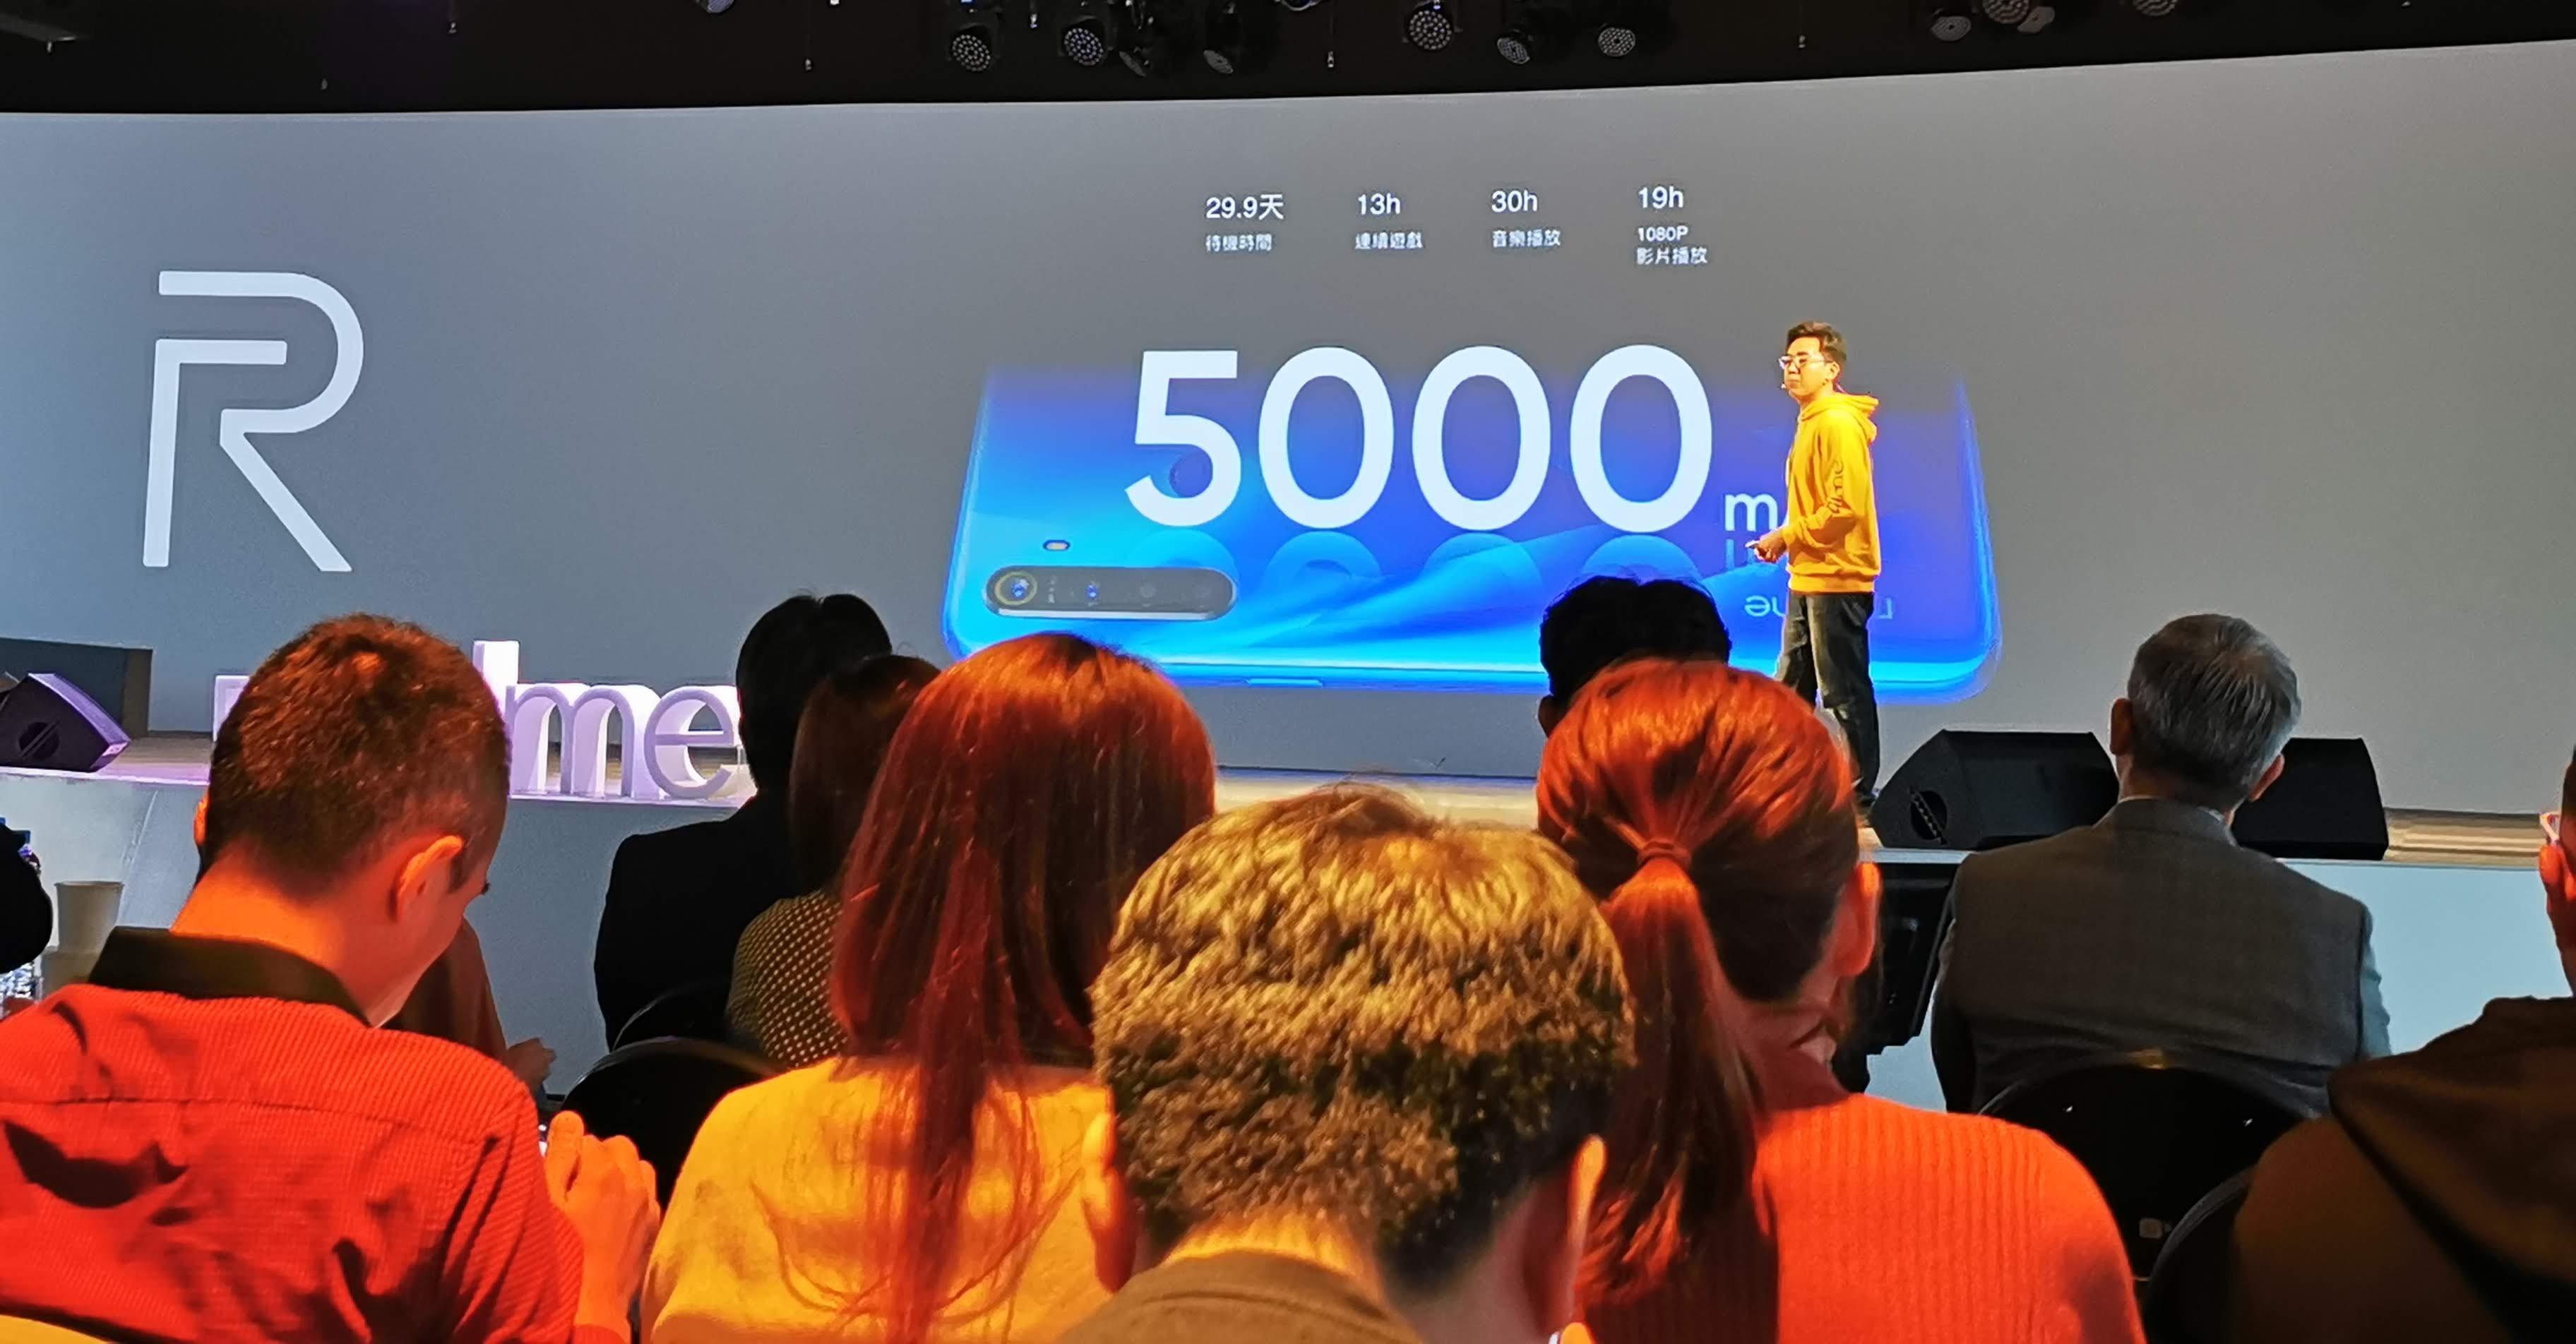 realme 5 採用高通 Snapdragon 665的處理器,更擁有超強續航的 5000 mAh大電池